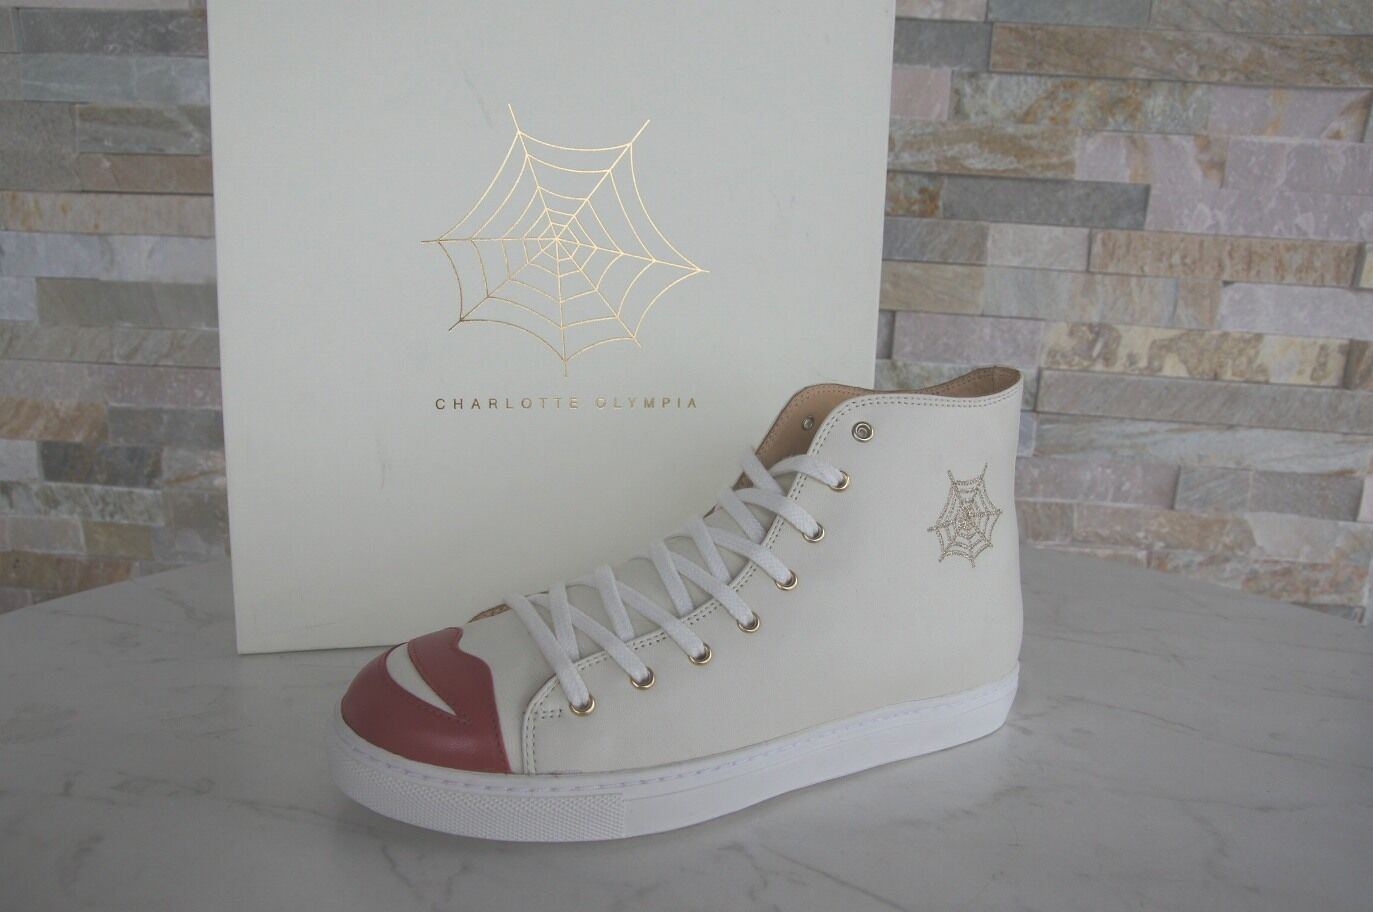 CHARLOTTE Top OLYMPIA Taglia 40 High Top CHARLOTTE Sneakers normalissime scarpe KISS NUOVO UVP 2e1158